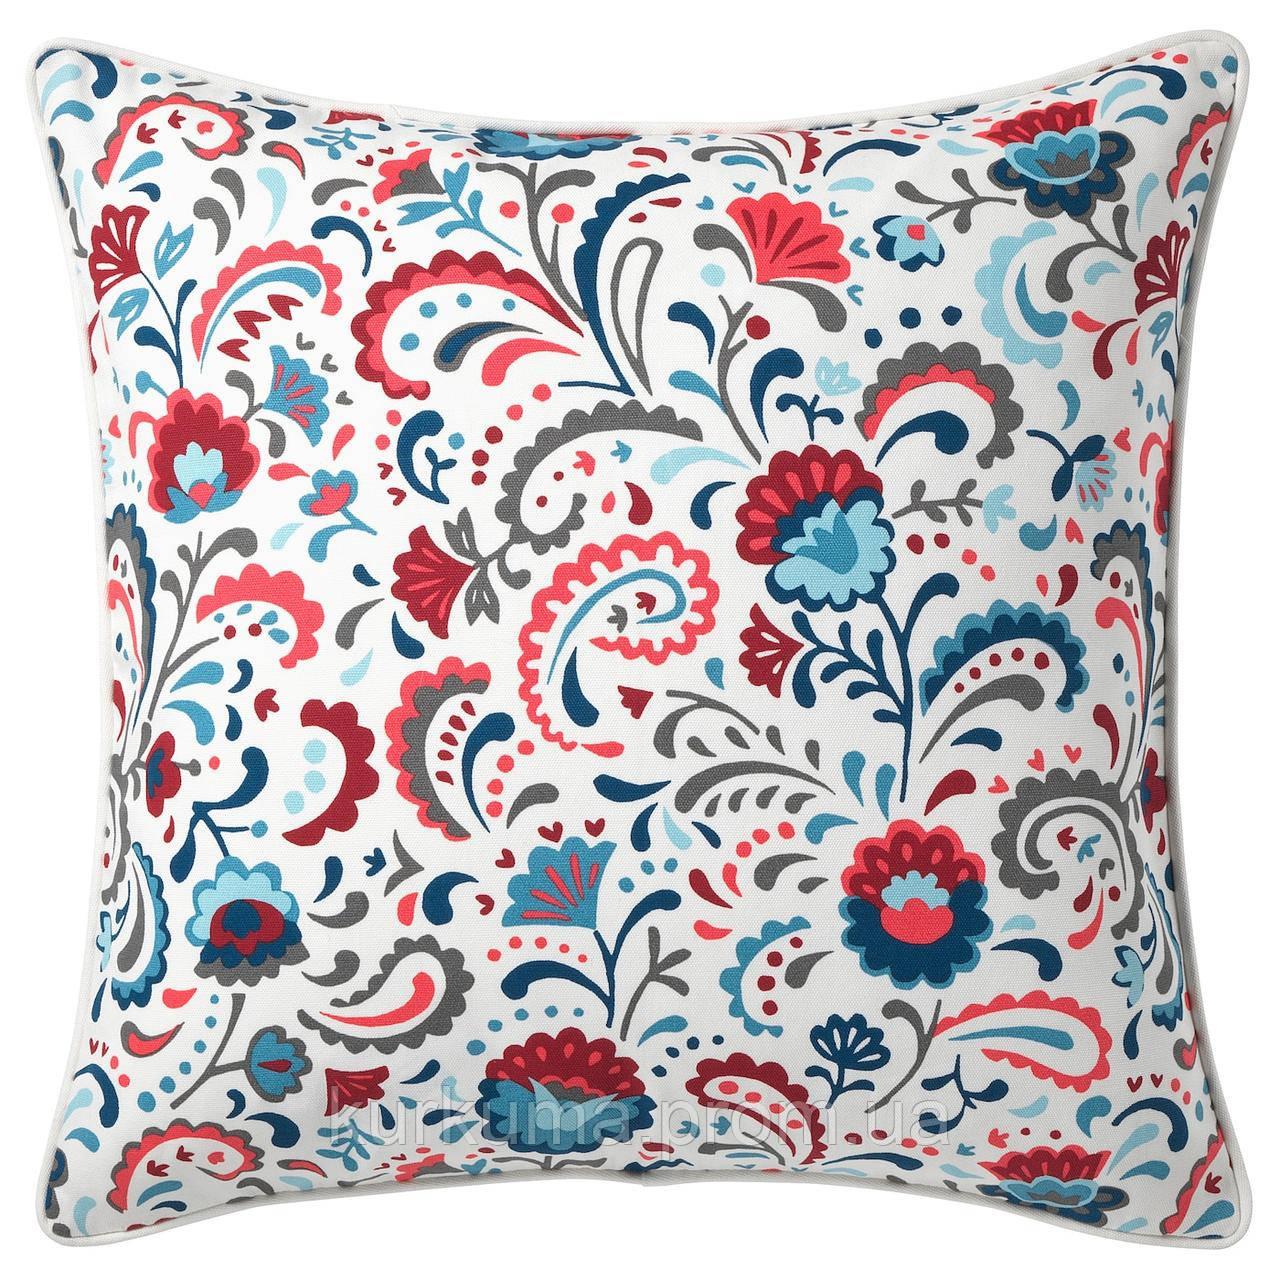 Наволочка на декоративную подушку IKEA KRATTEN 50x50 см (004.474.25)